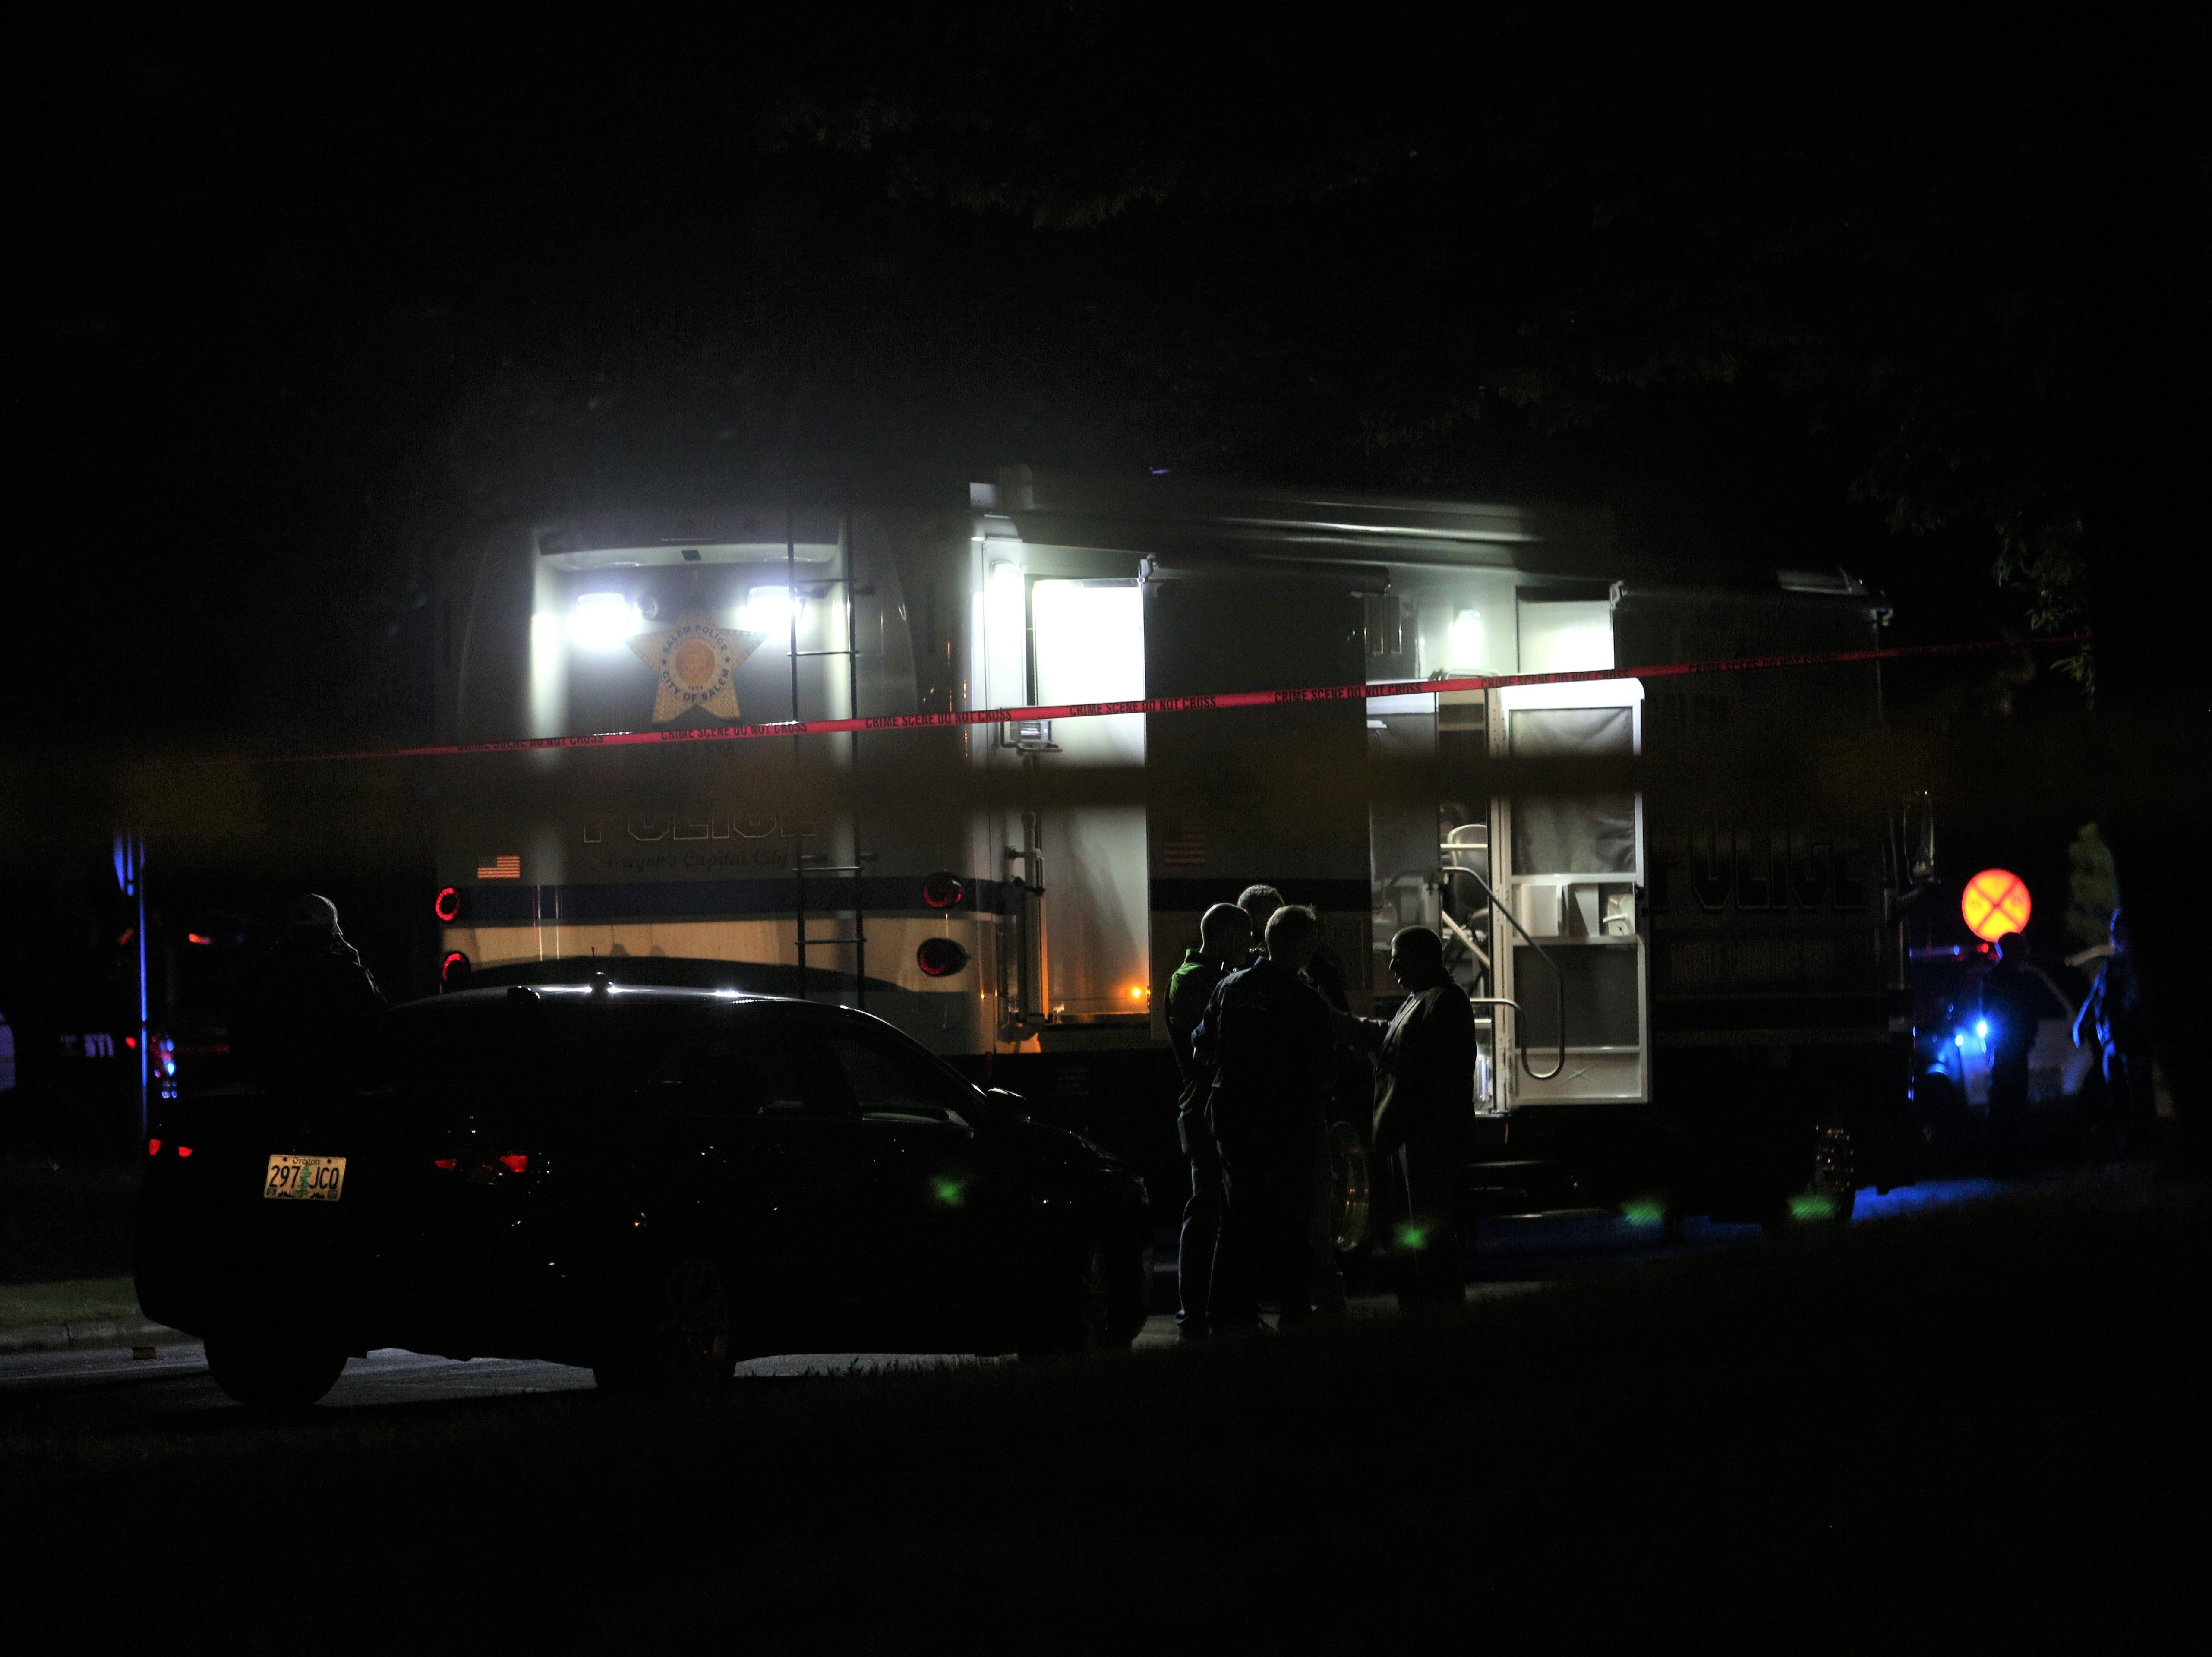 Salem Police set up a mobile command unit near Highland Elementary School in Salem on May 14, 2019.